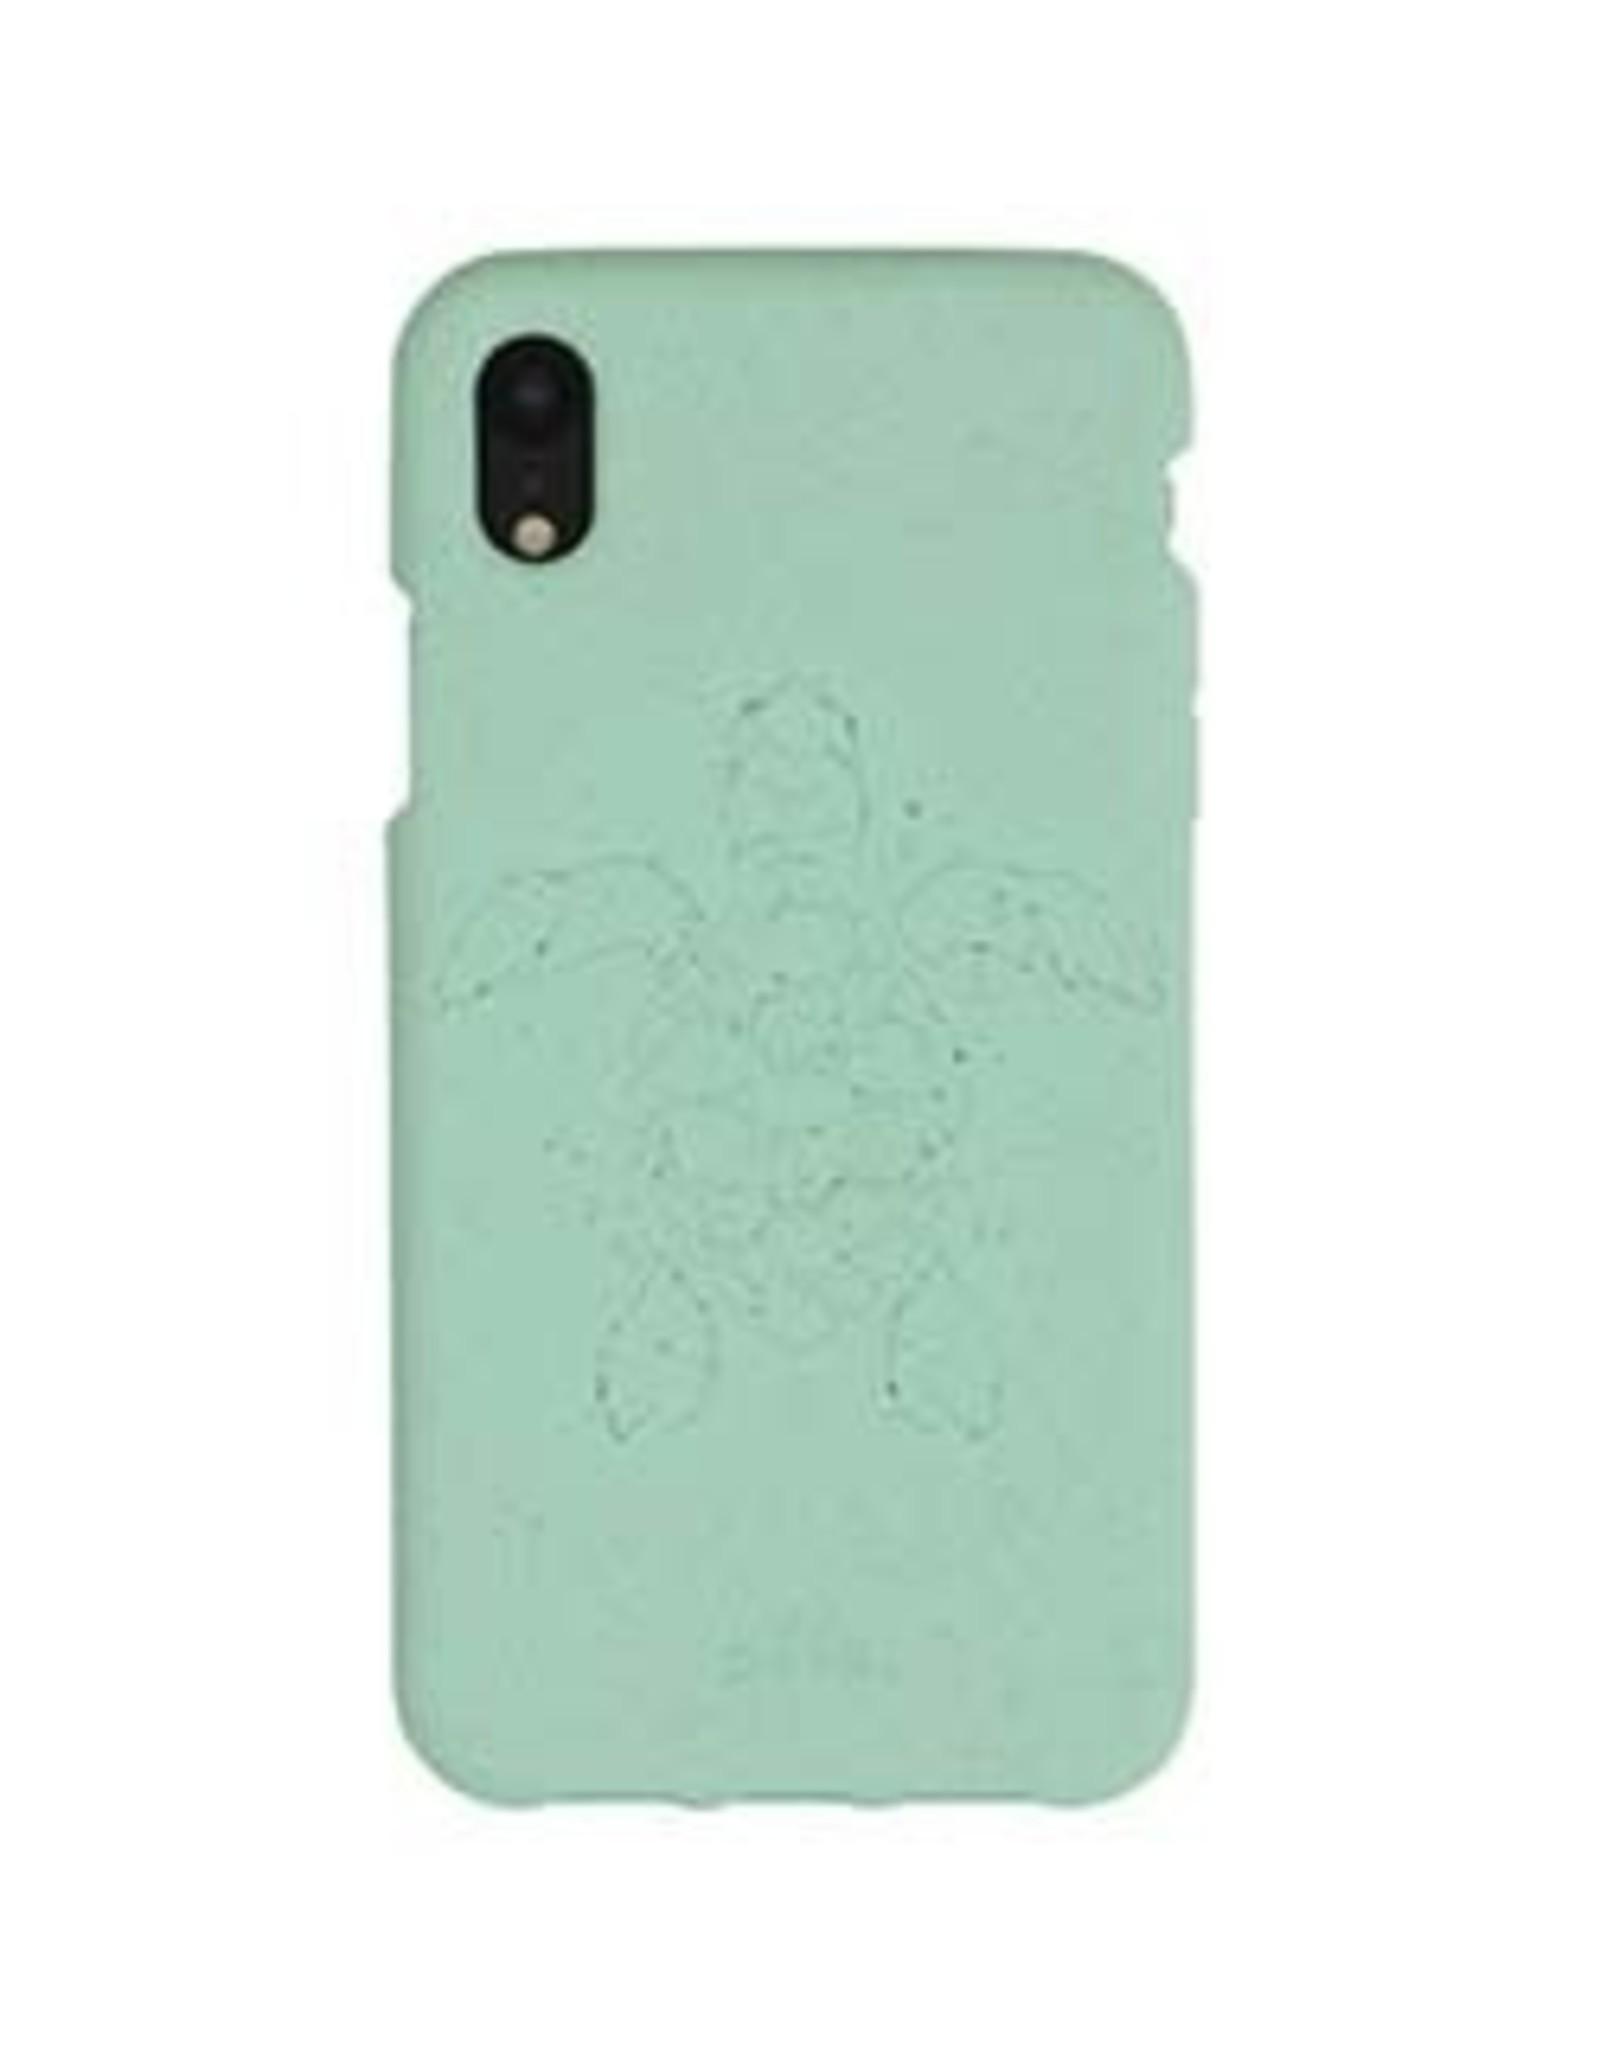 Pela Pela | iPhone XR Turquoise Turtle Edition Compostable Eco-Friendly Protective Case | 15-04739